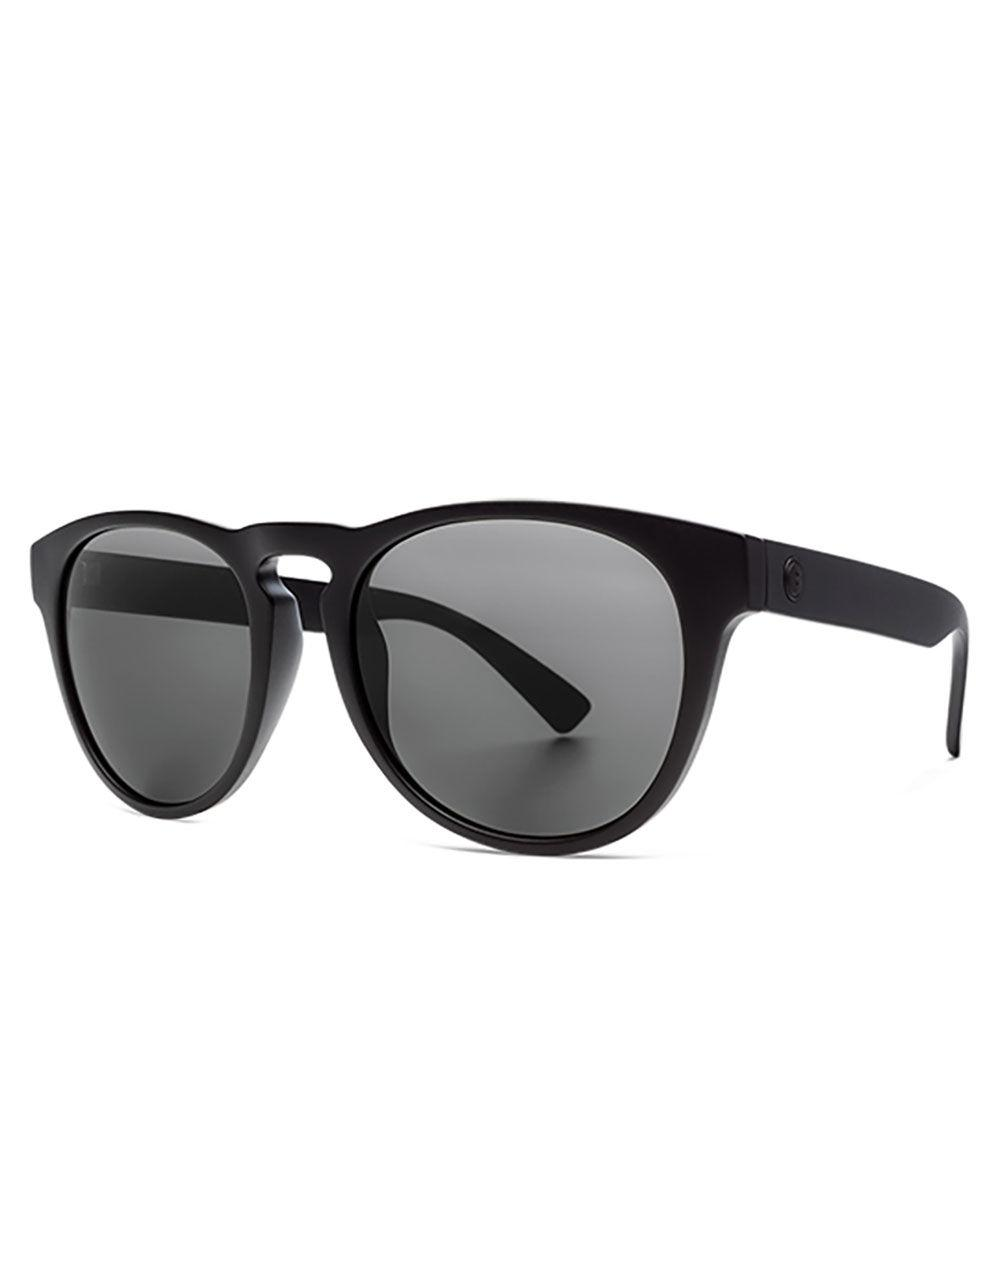 4f1e6d6d6bfa Lyst - Electric Nashville Xl Sunglasses in Gray for Men